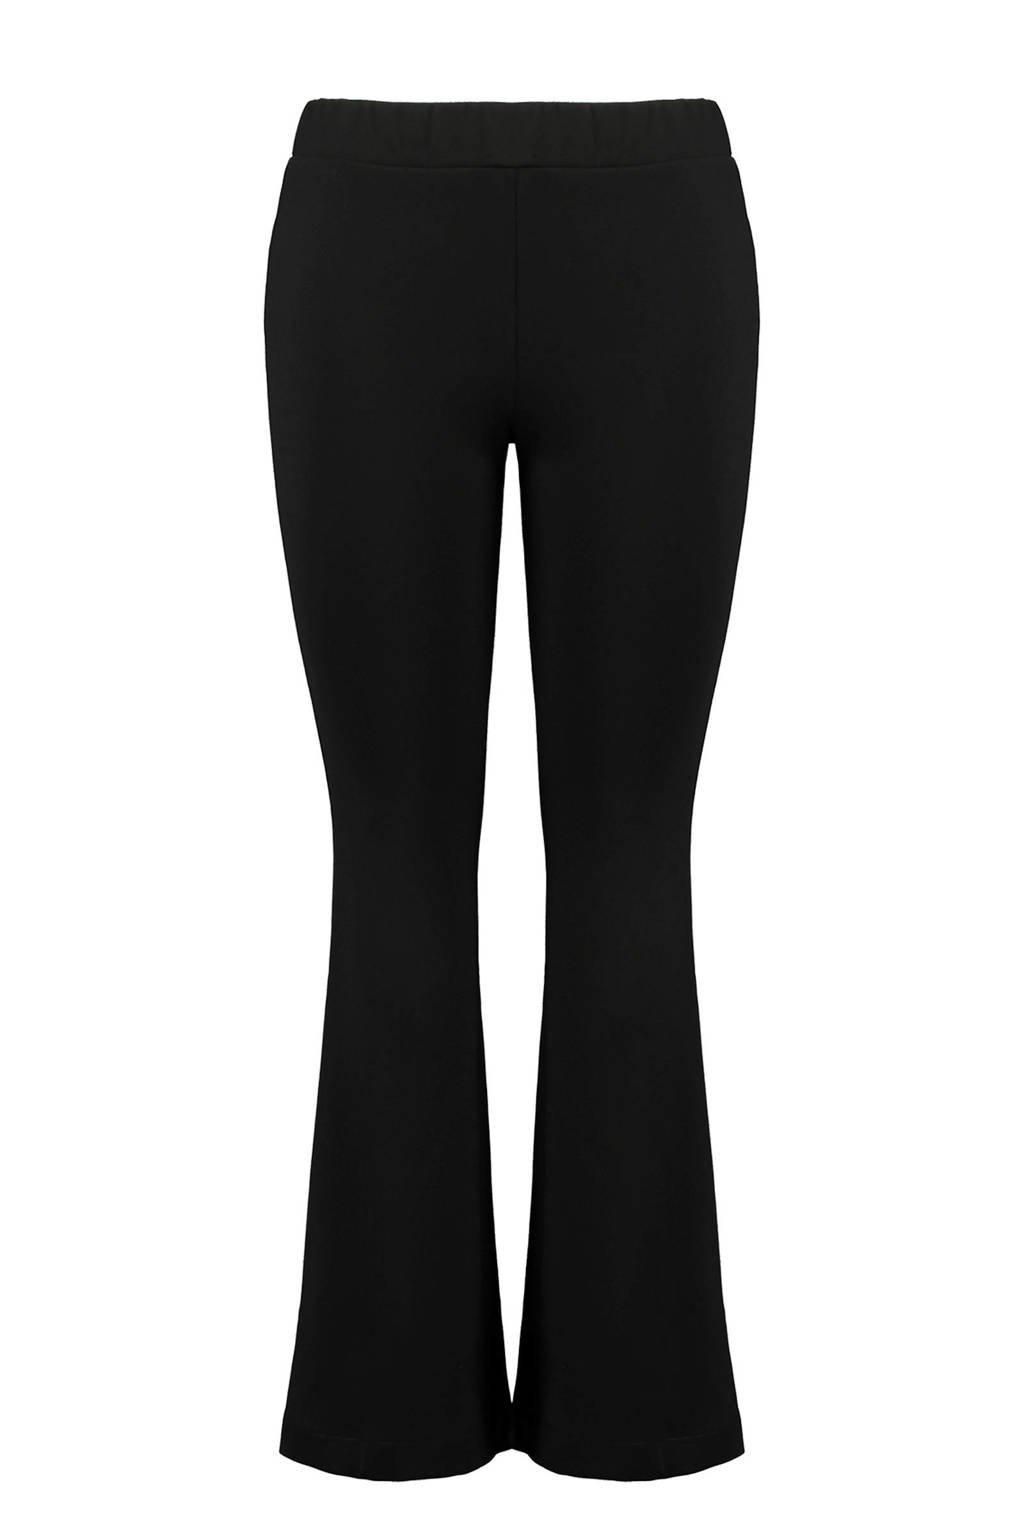 MS Mode tregging zwart, Zwart